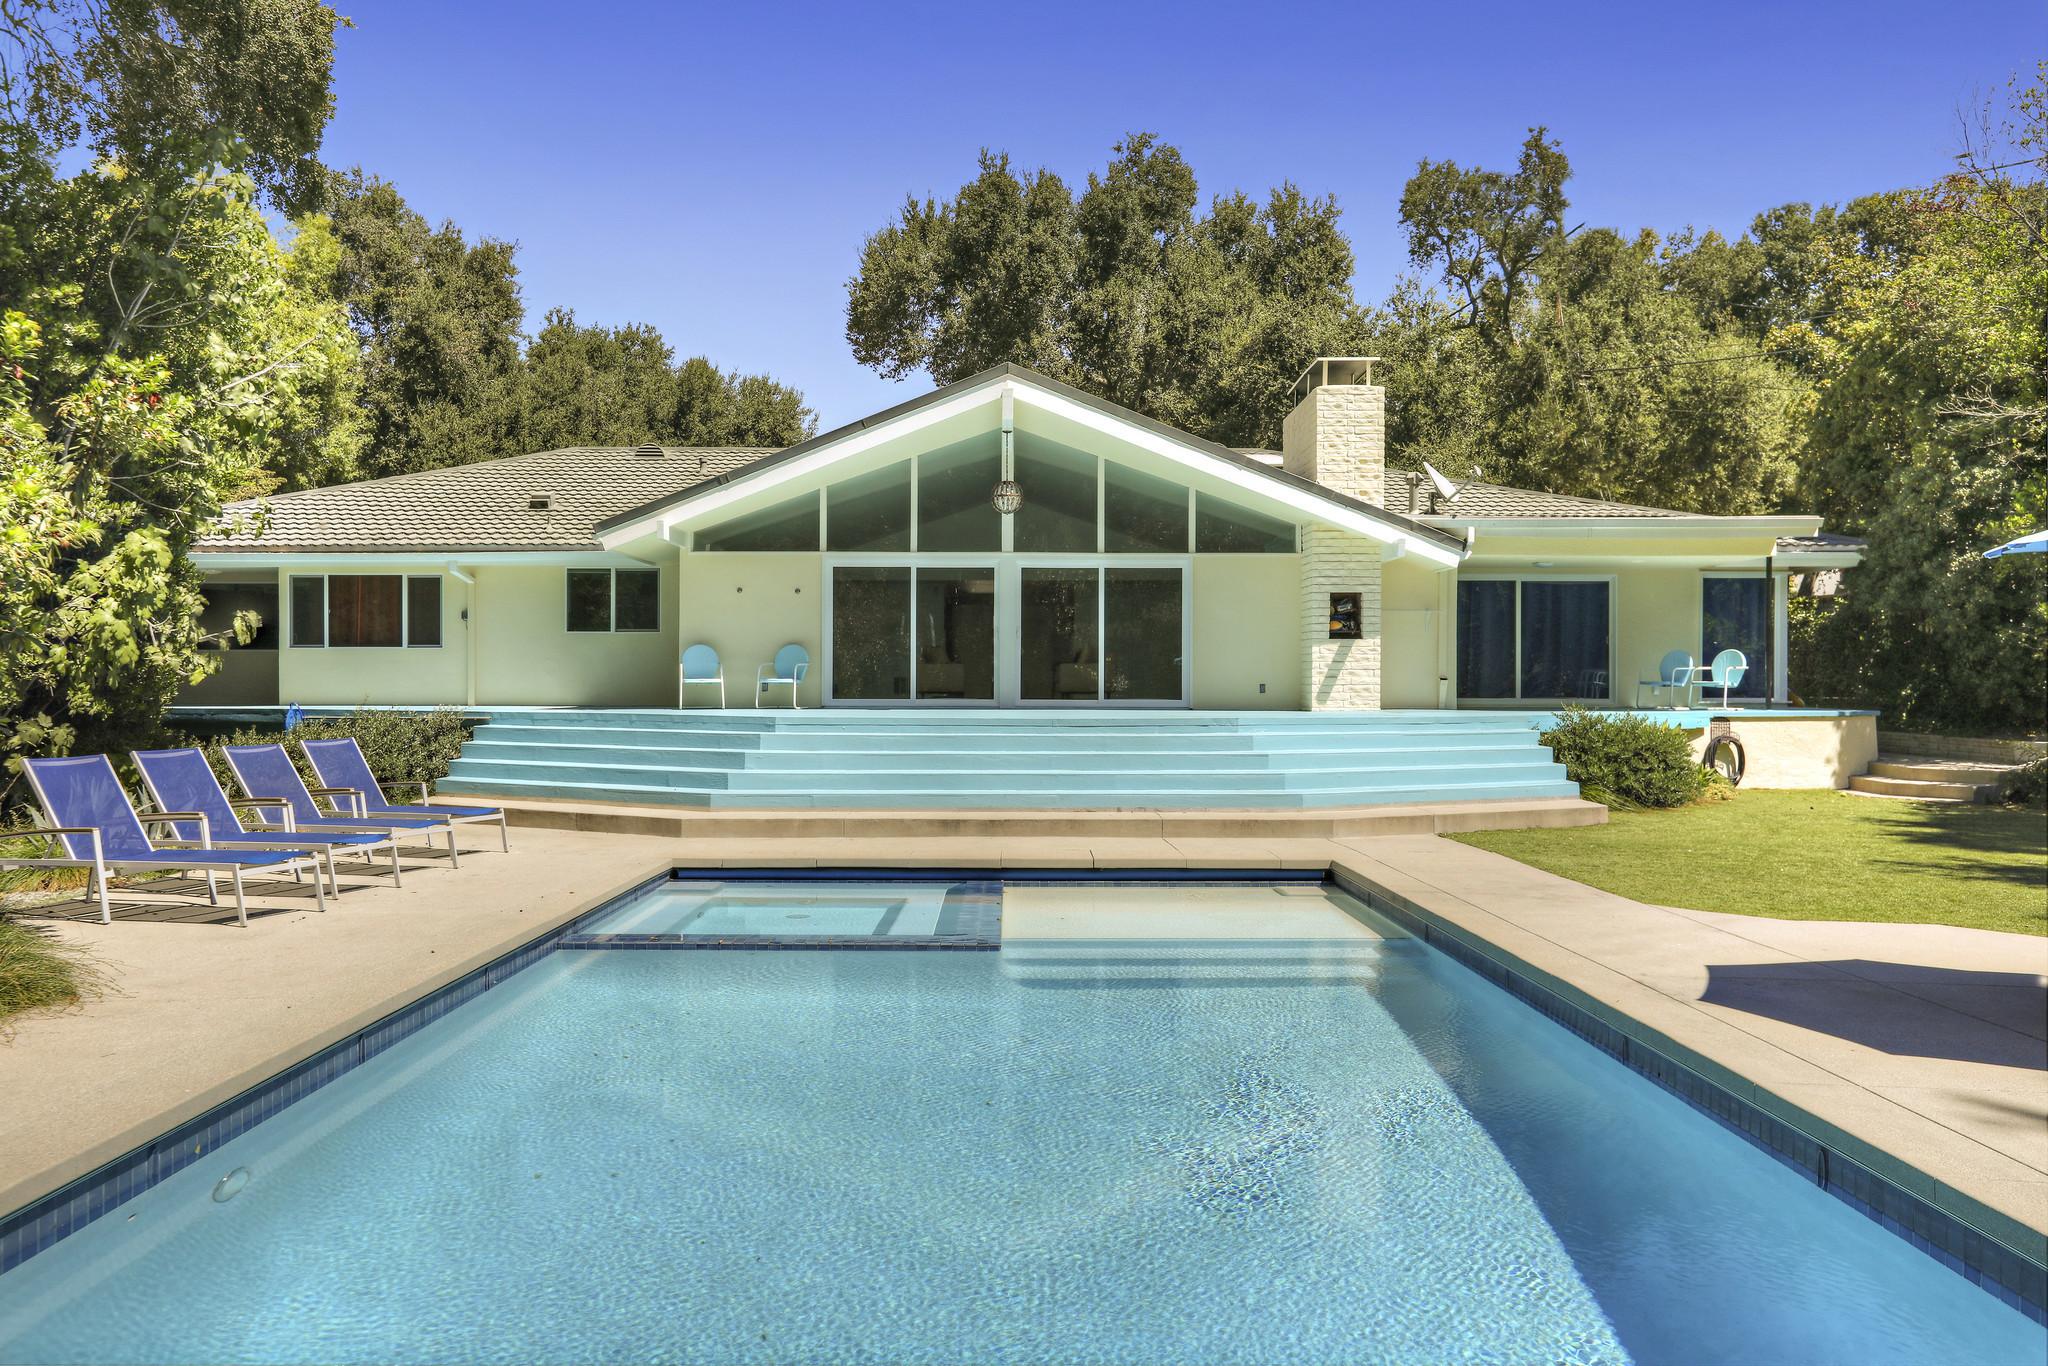 Adam Carollas La Ca Ada Flintridge Home - Hot Property